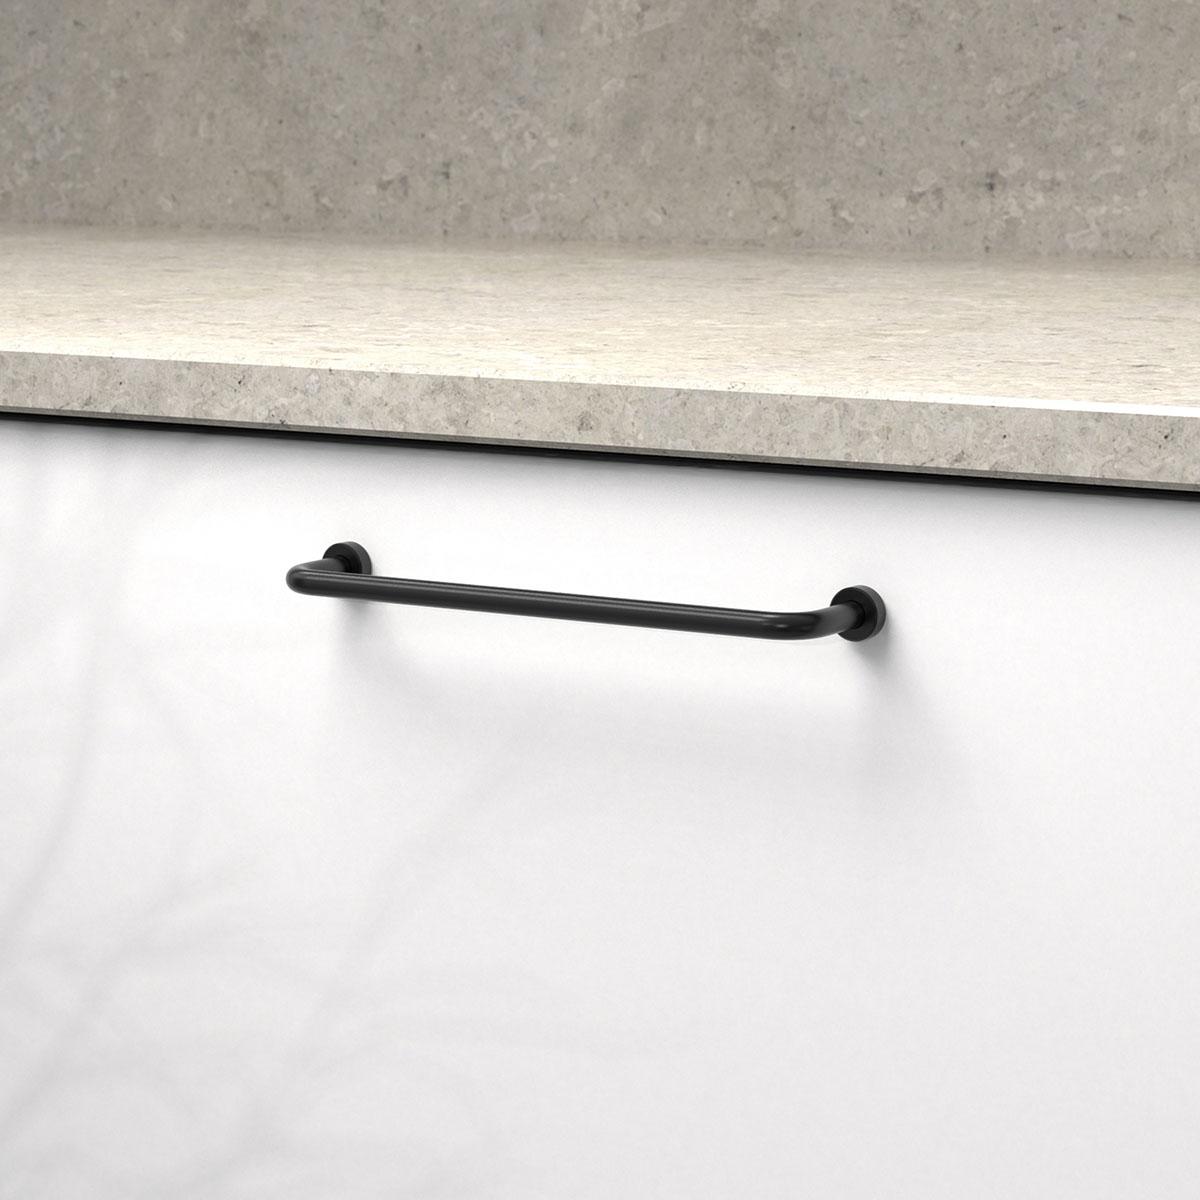 Handtag lounge svart 370123 11 cc 160 mm ncs s 0300 n kalksten